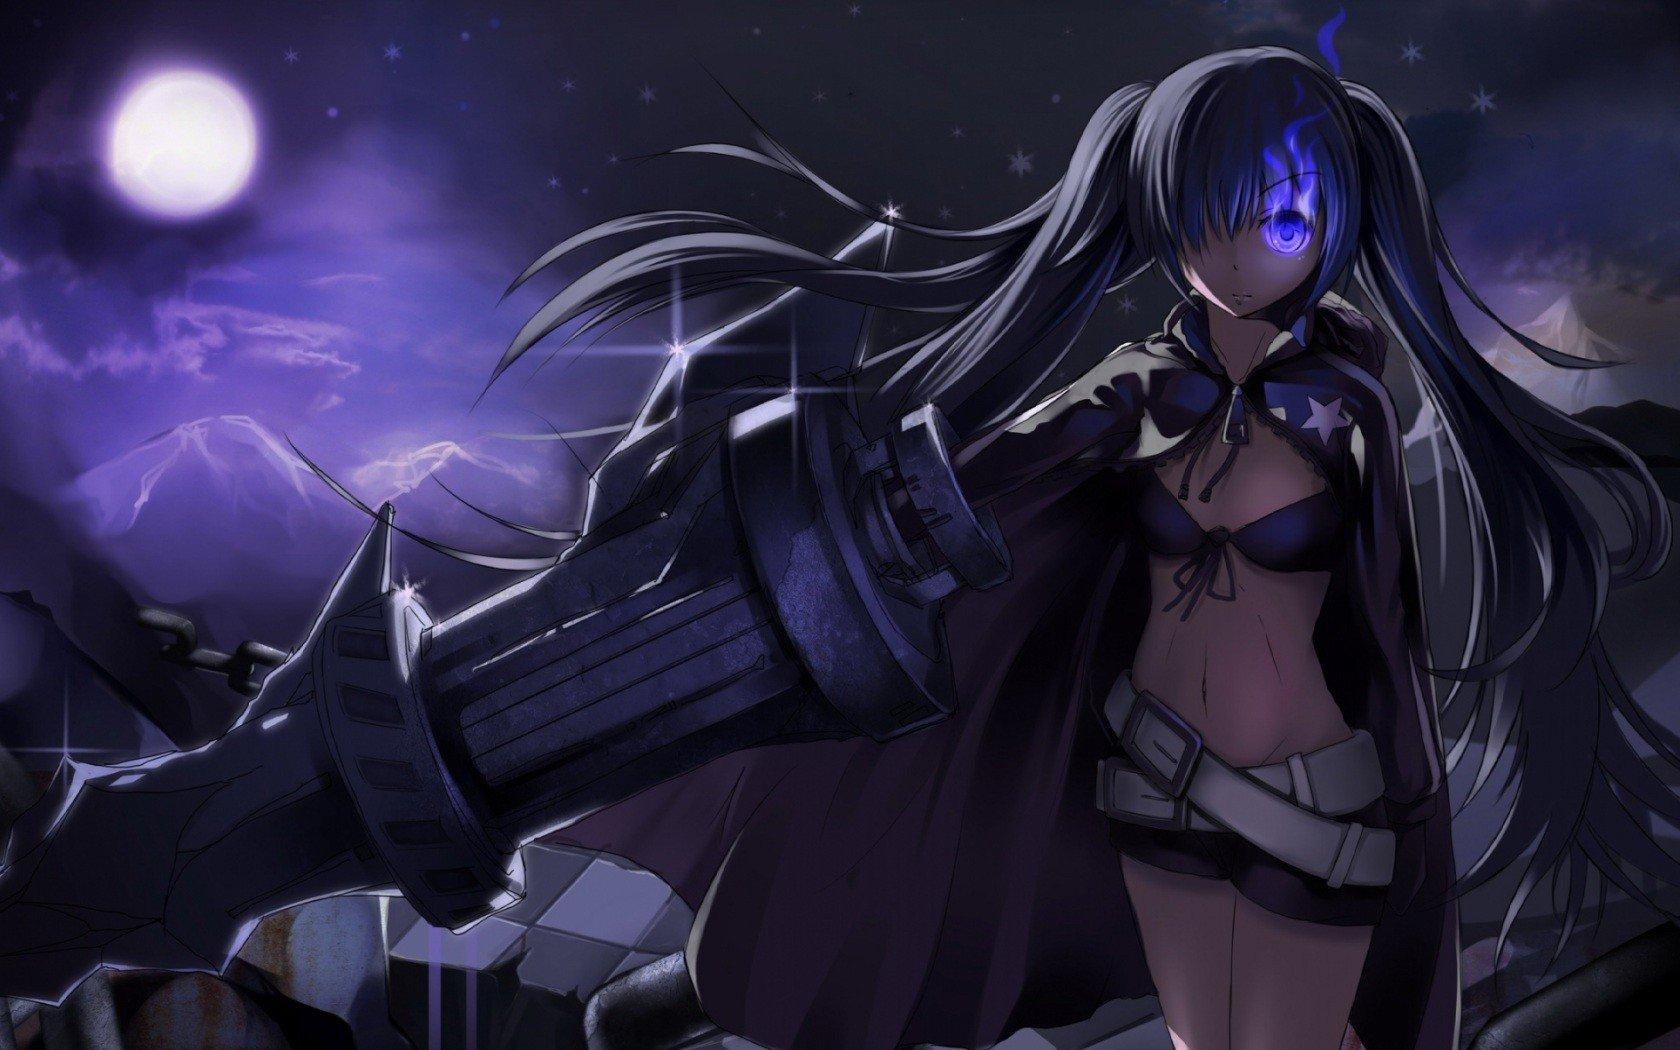 Black rock shooter anime girls anime weapon strength - Anime wallpaper black background ...